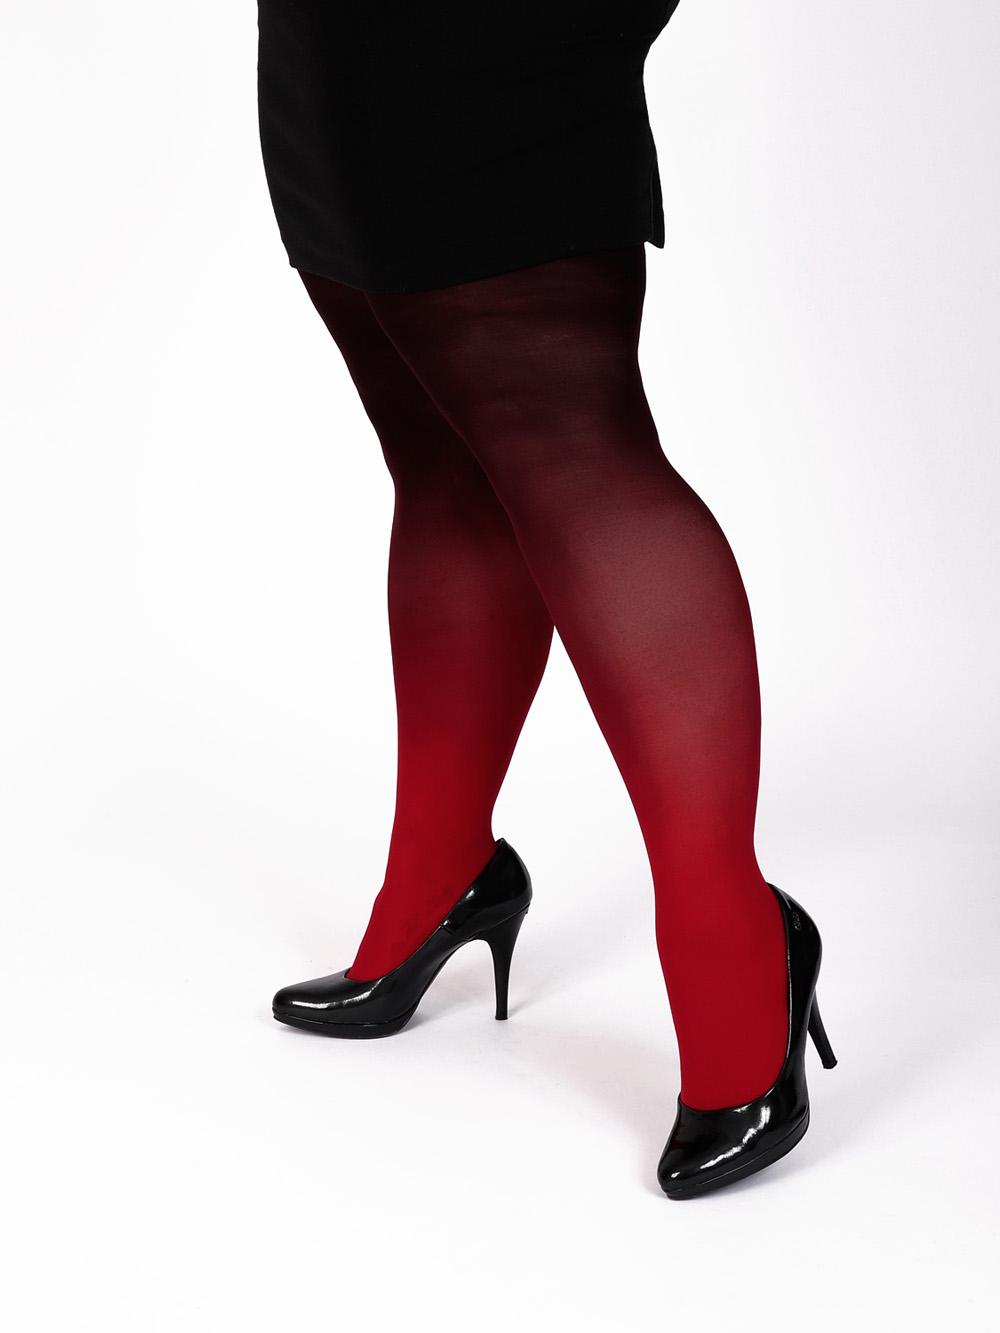 Plus Size Rot-schwarz Strumpfhose